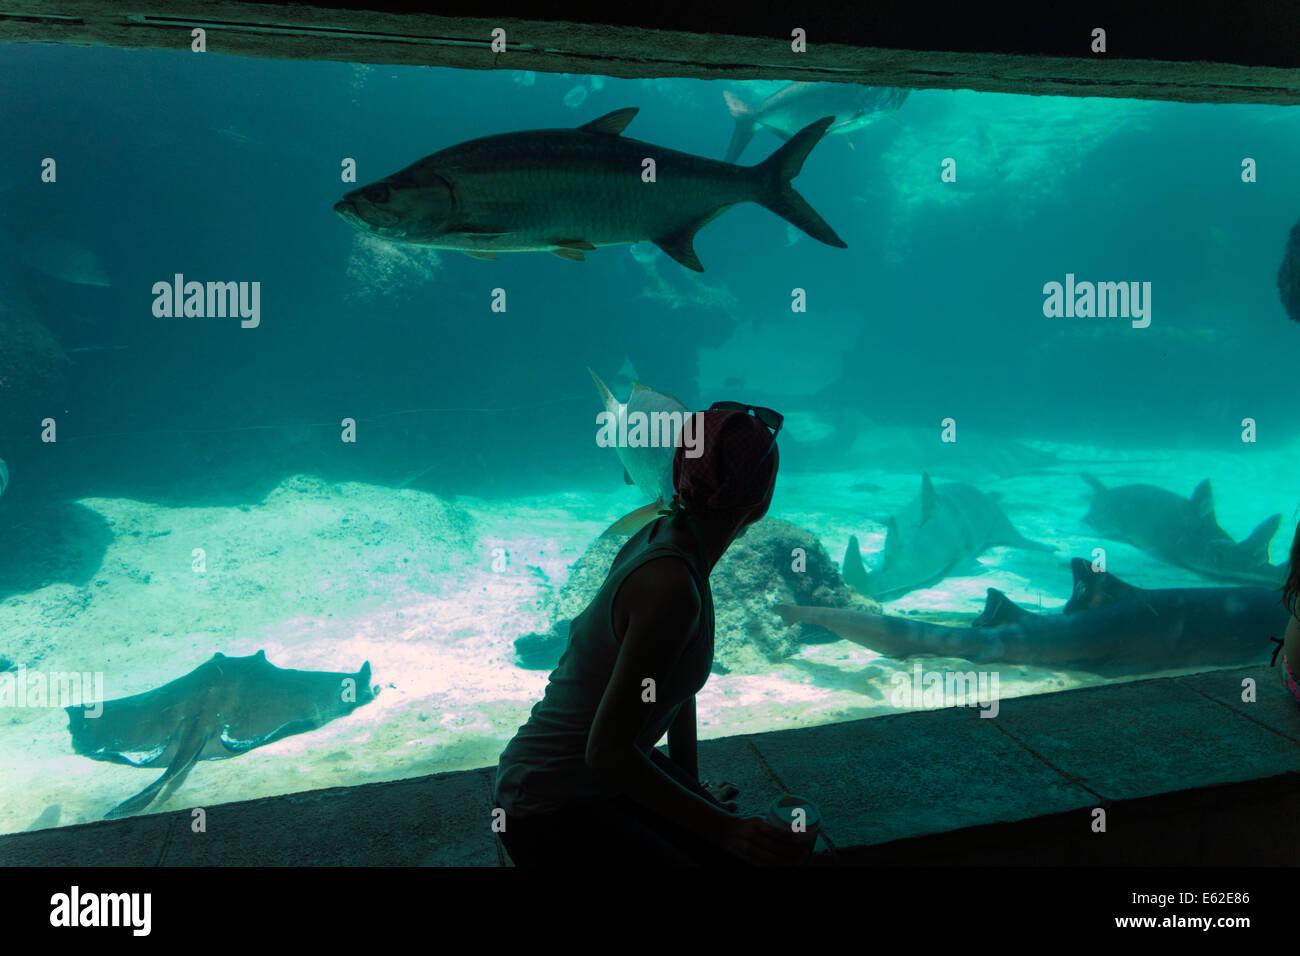 girl looking at fish in aquarium tank, Atlantis Paradise Island resort, The Bahamas - Stock Image